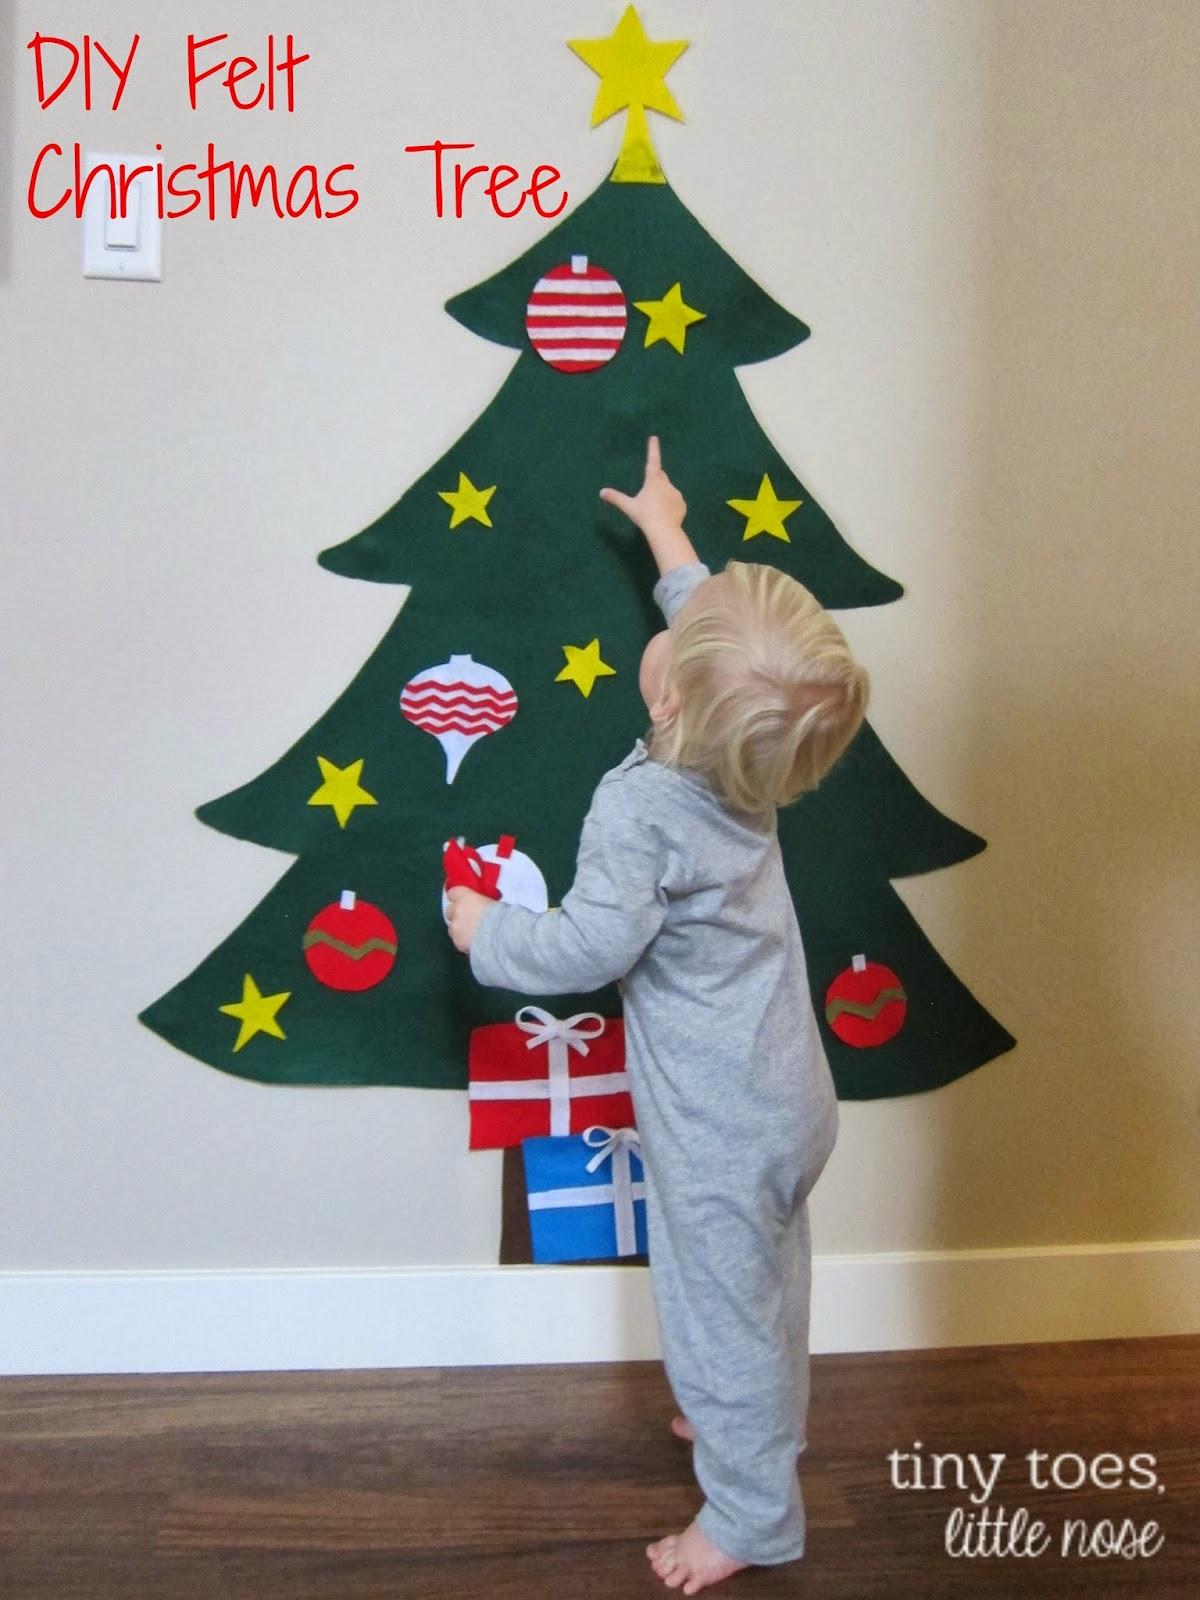 laurabird: DIY Felt Christmas Tree